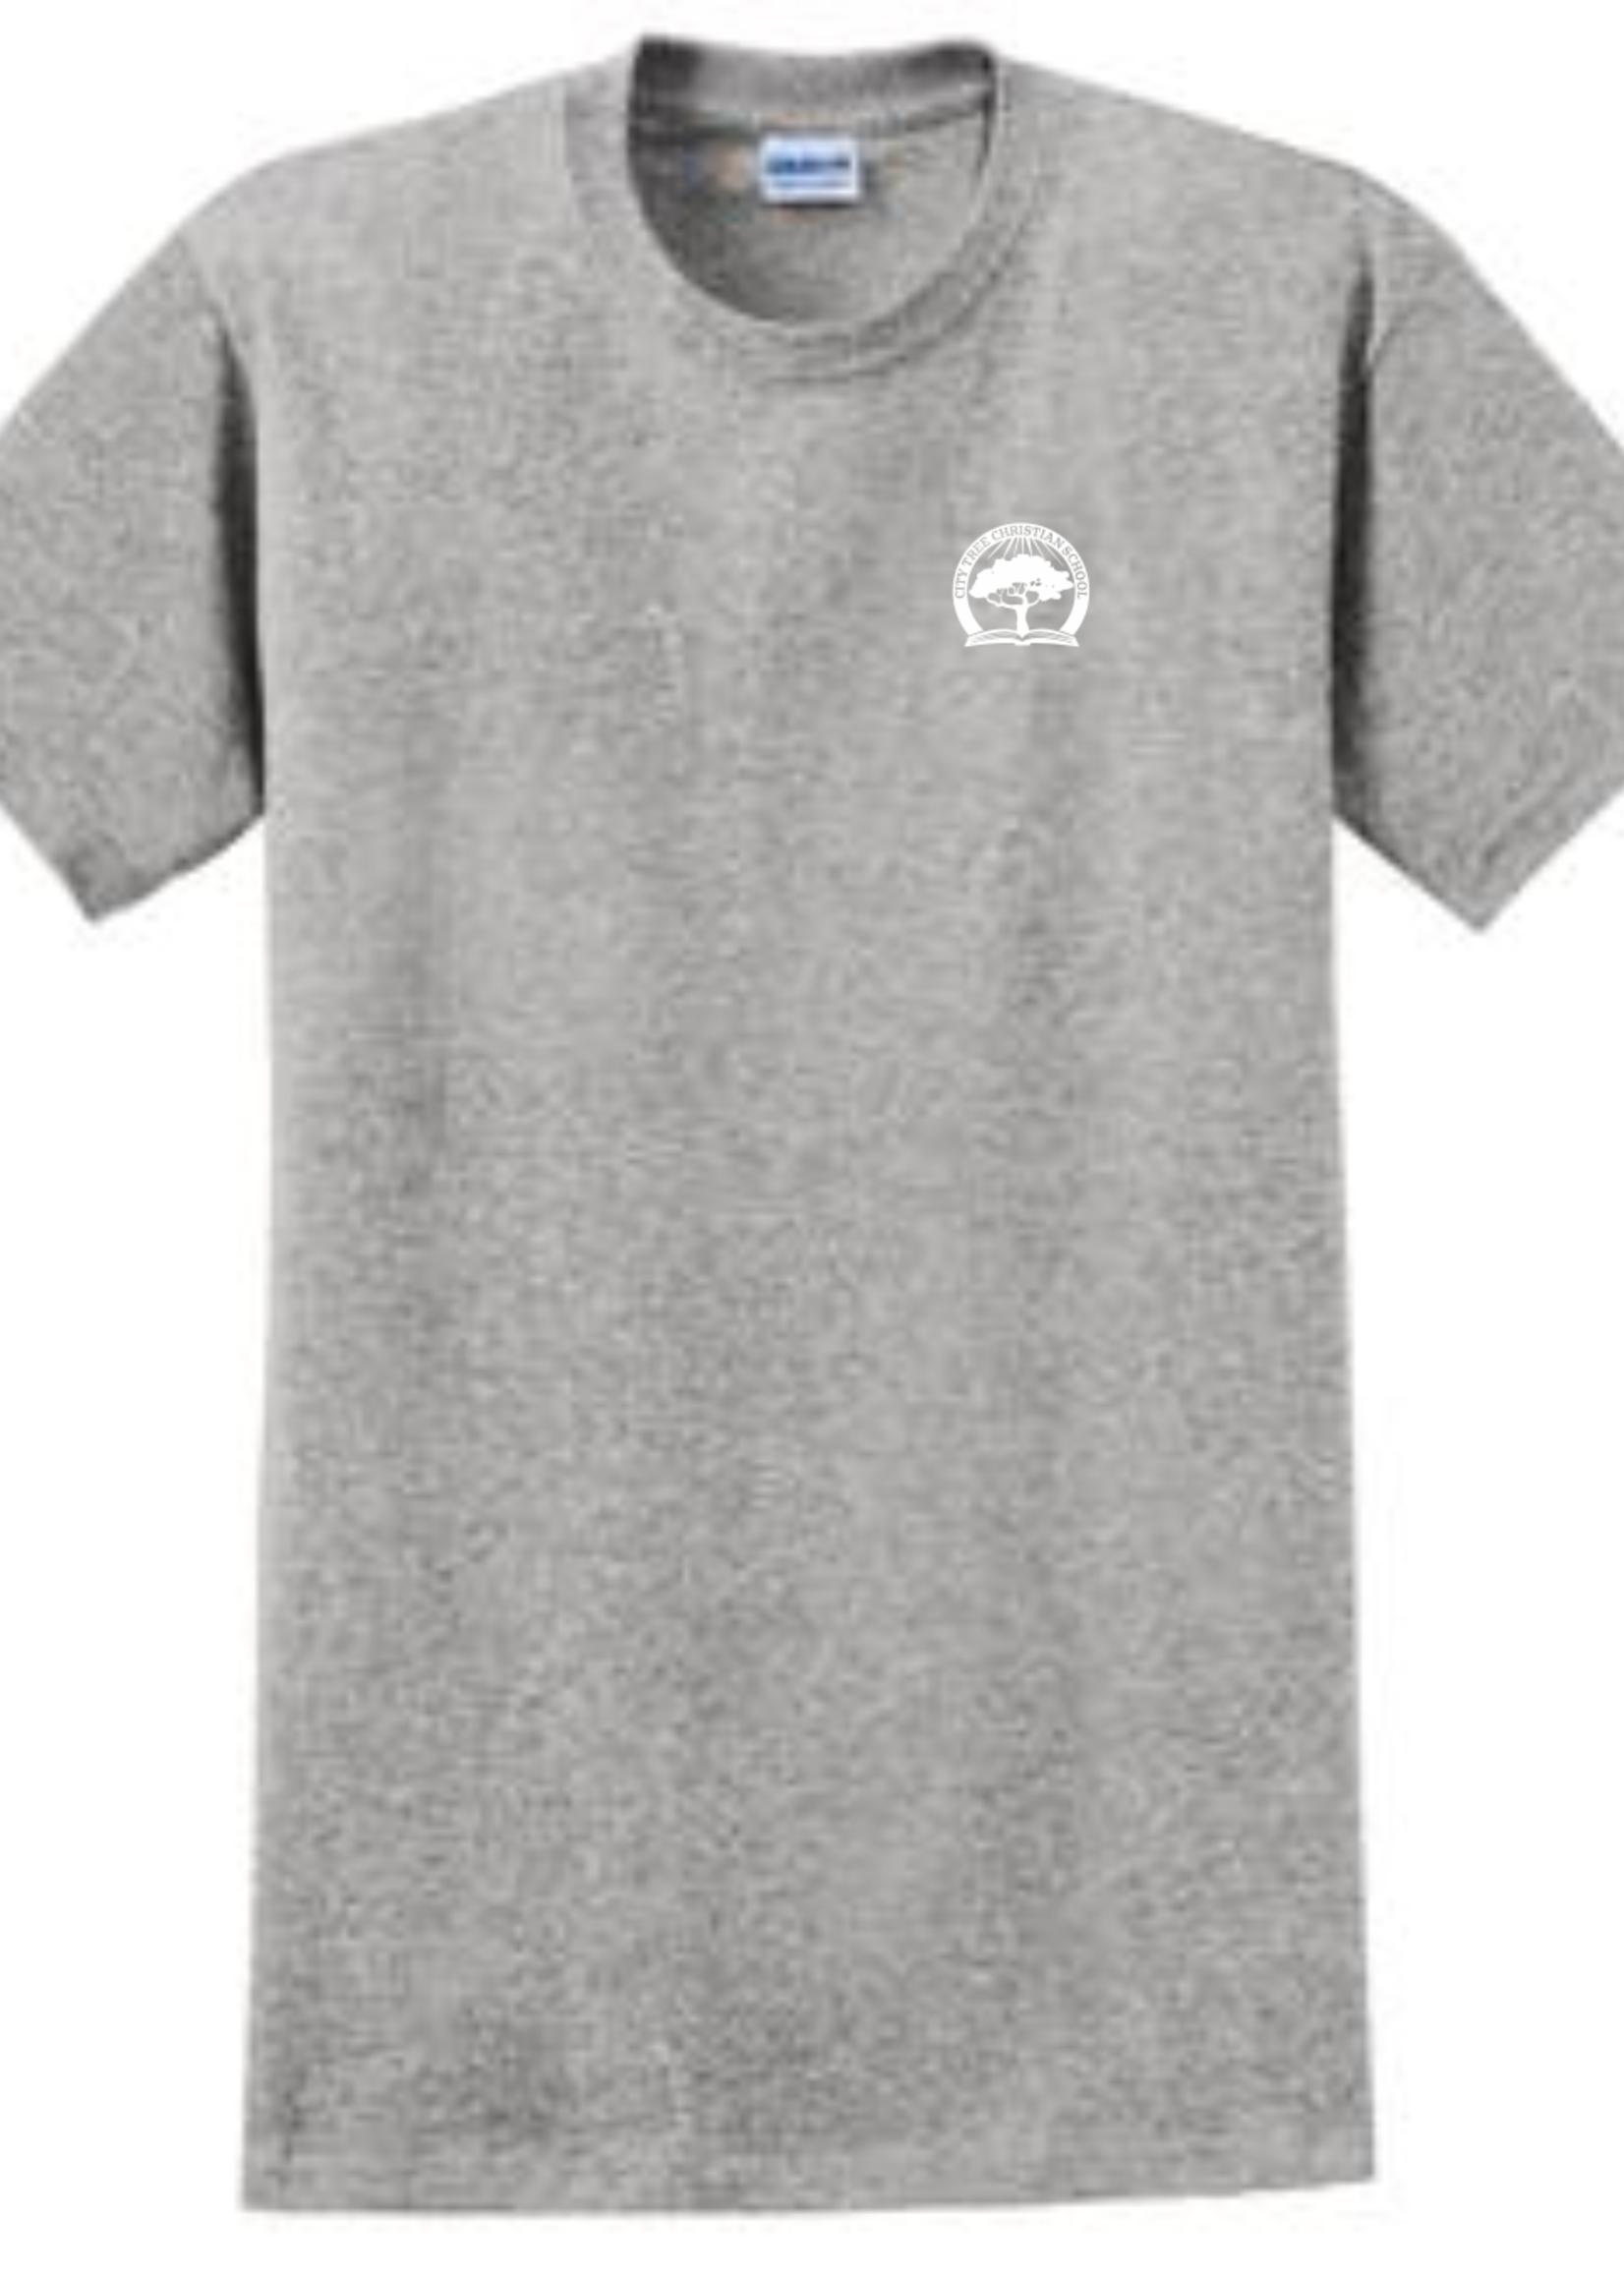 CTCS Sport Grey short sleeve T-Shirt